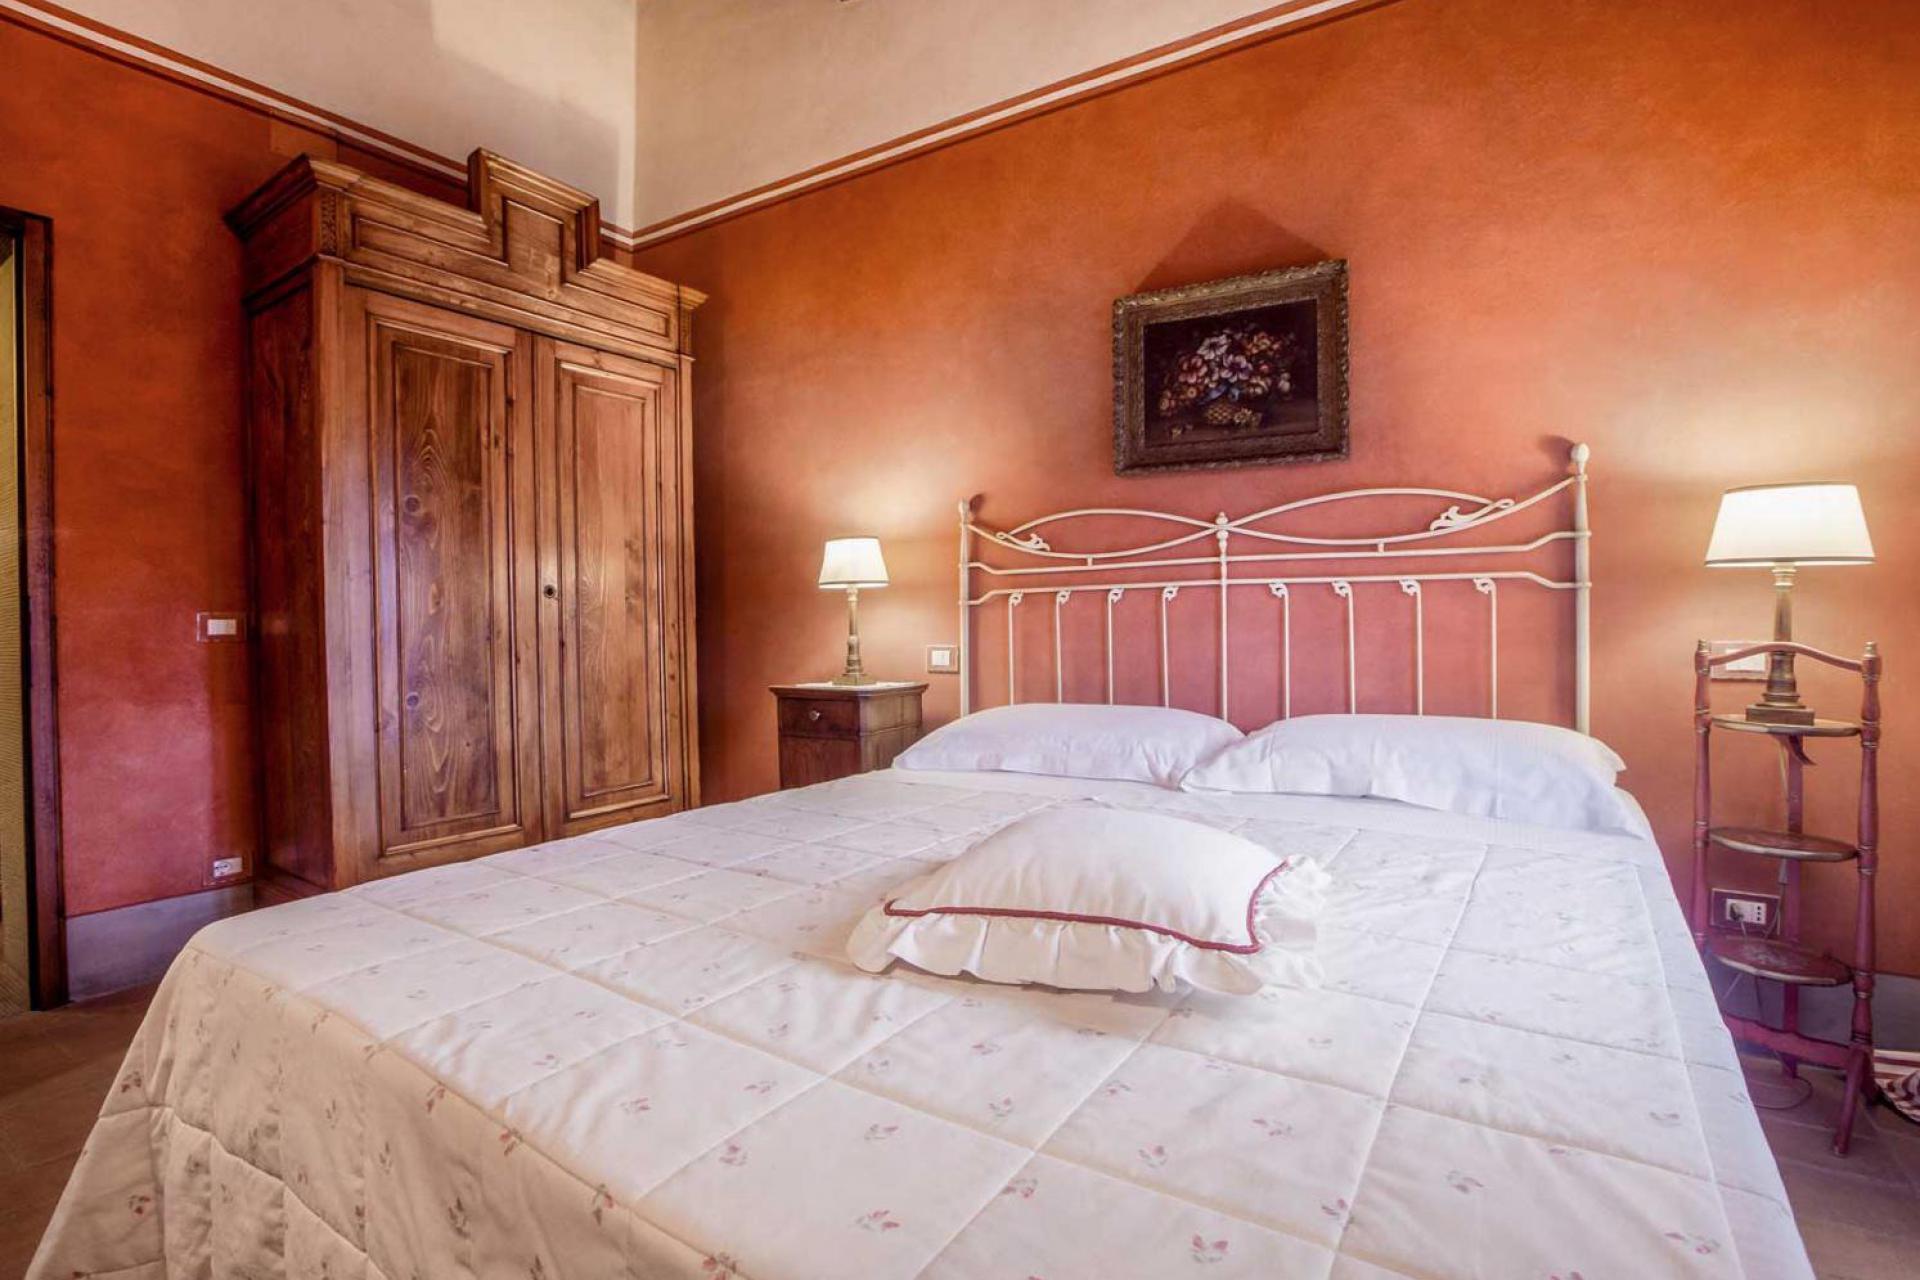 Agriturismo Toskana Agriturismo Toskana, Lucca, ideal für Familien